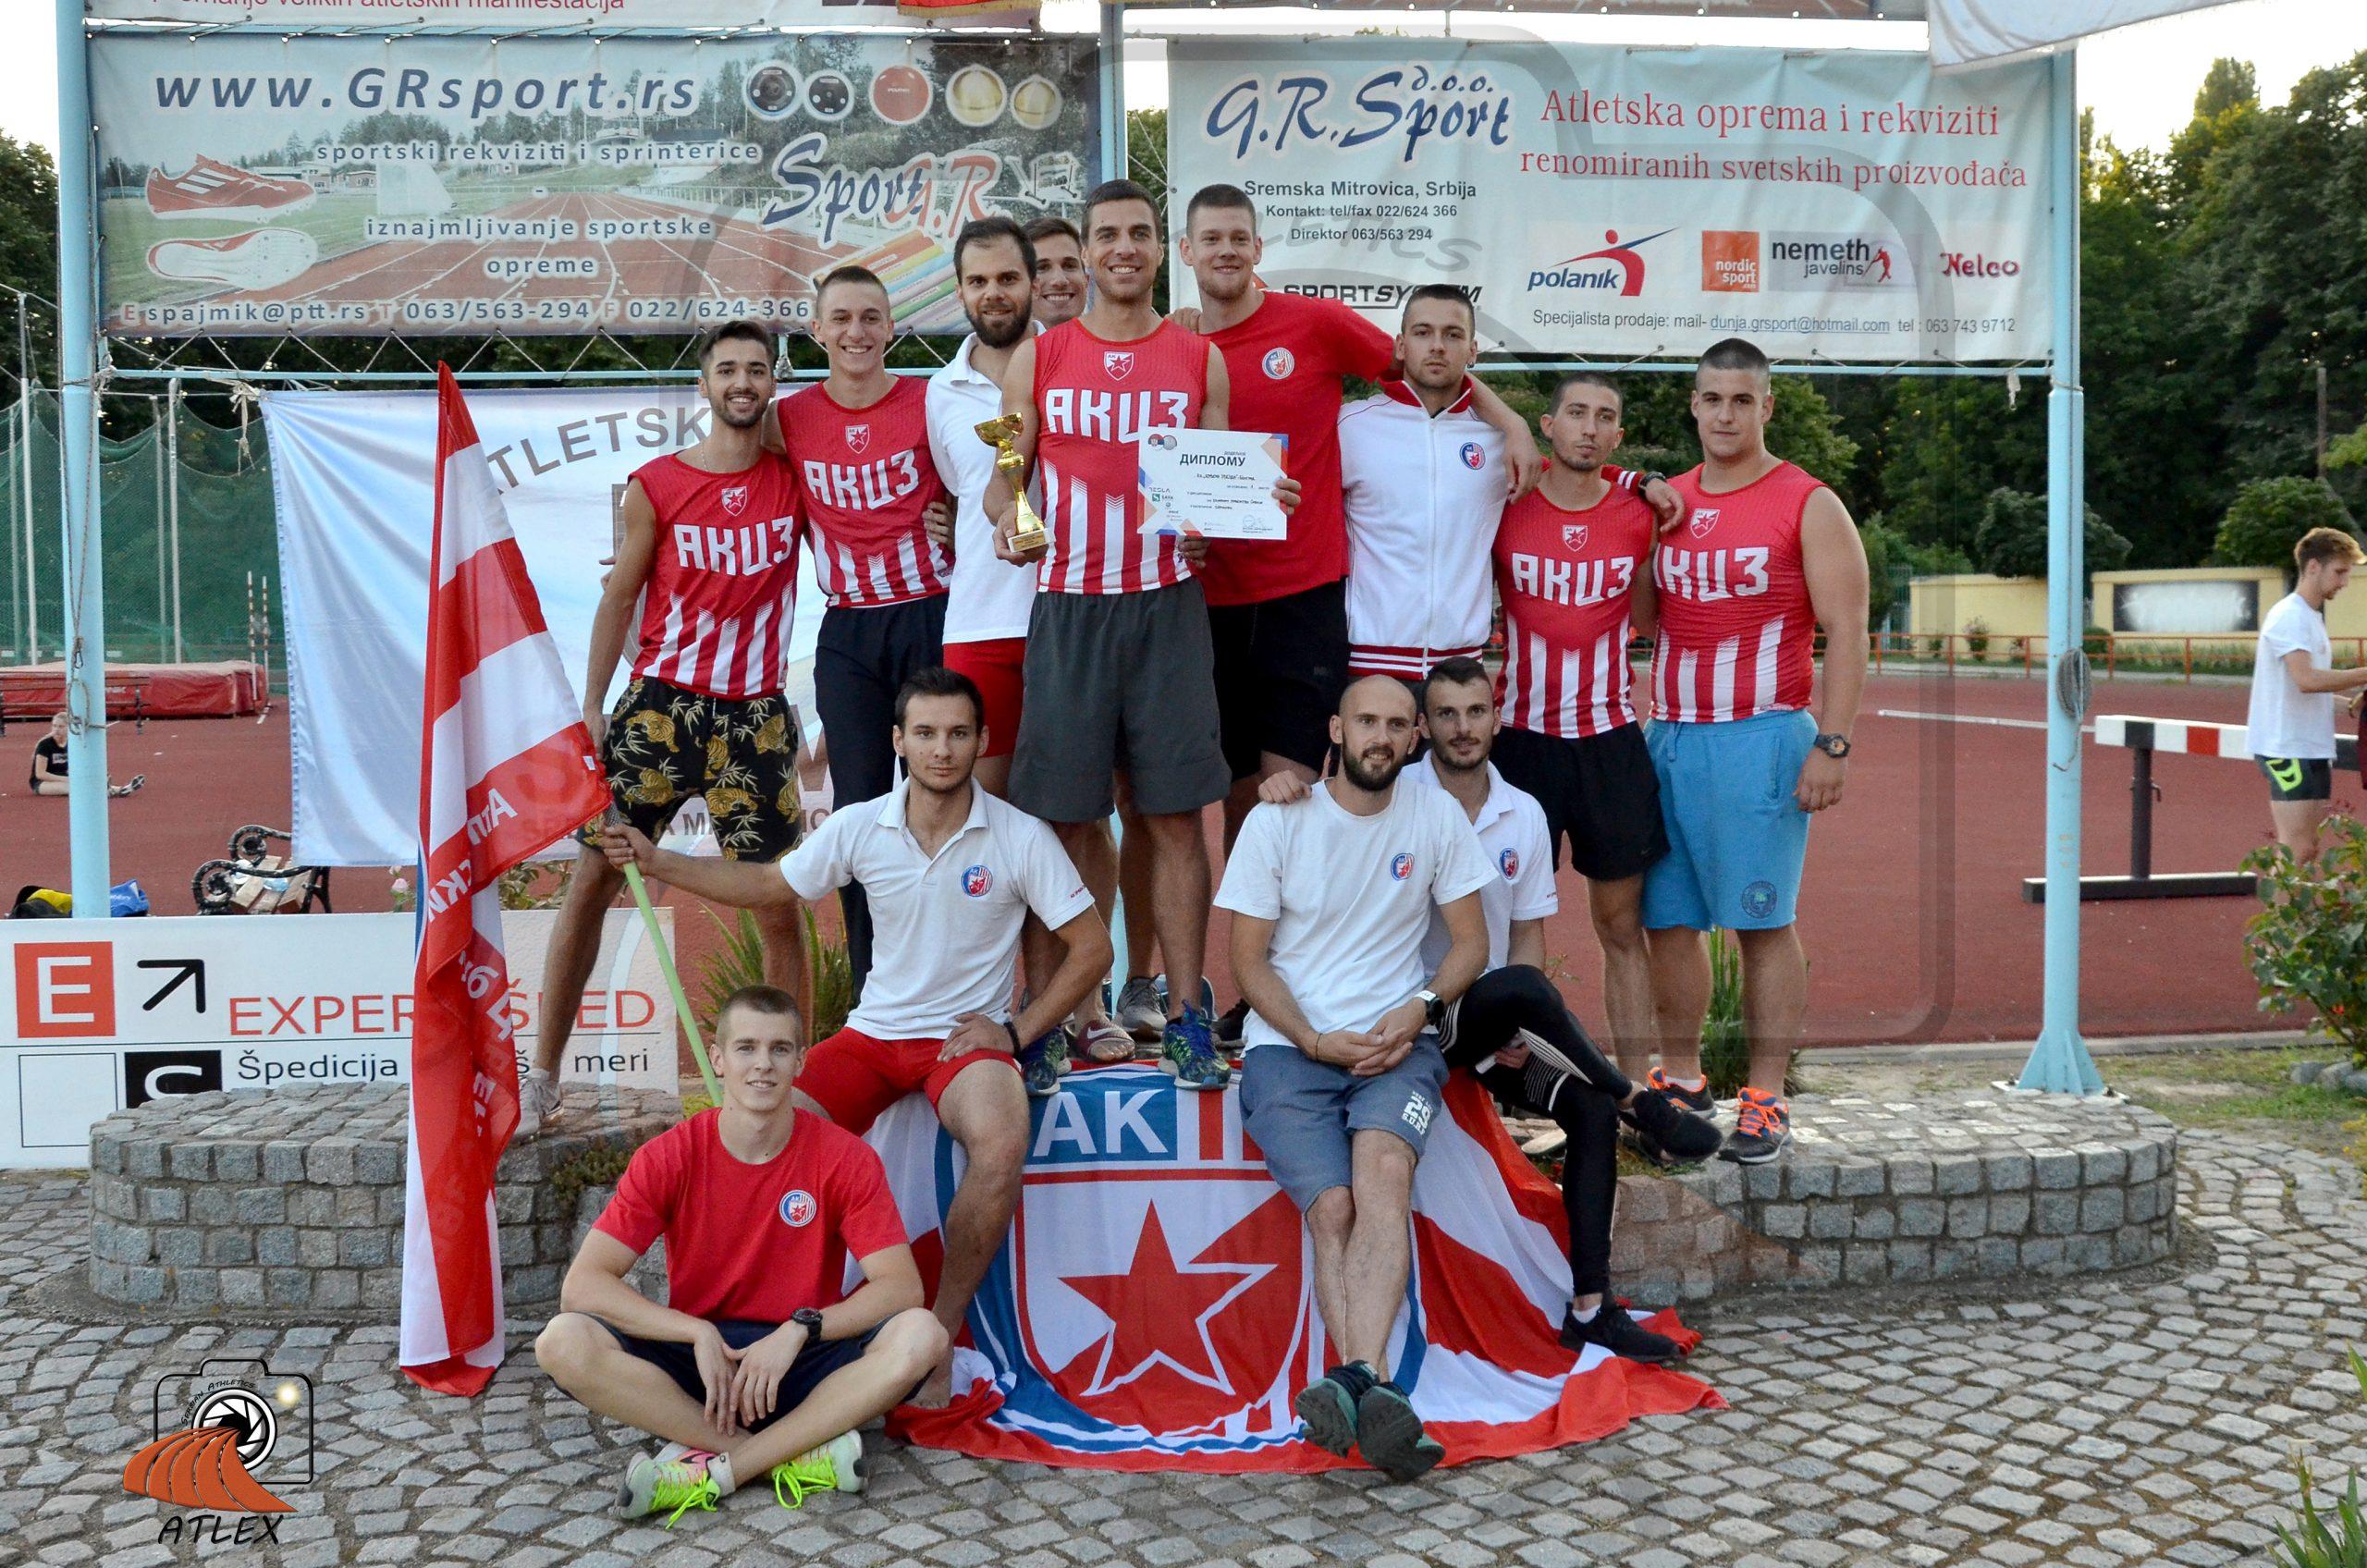 Muška ekipa Crvene zvezde prvak Srbije za 2019.